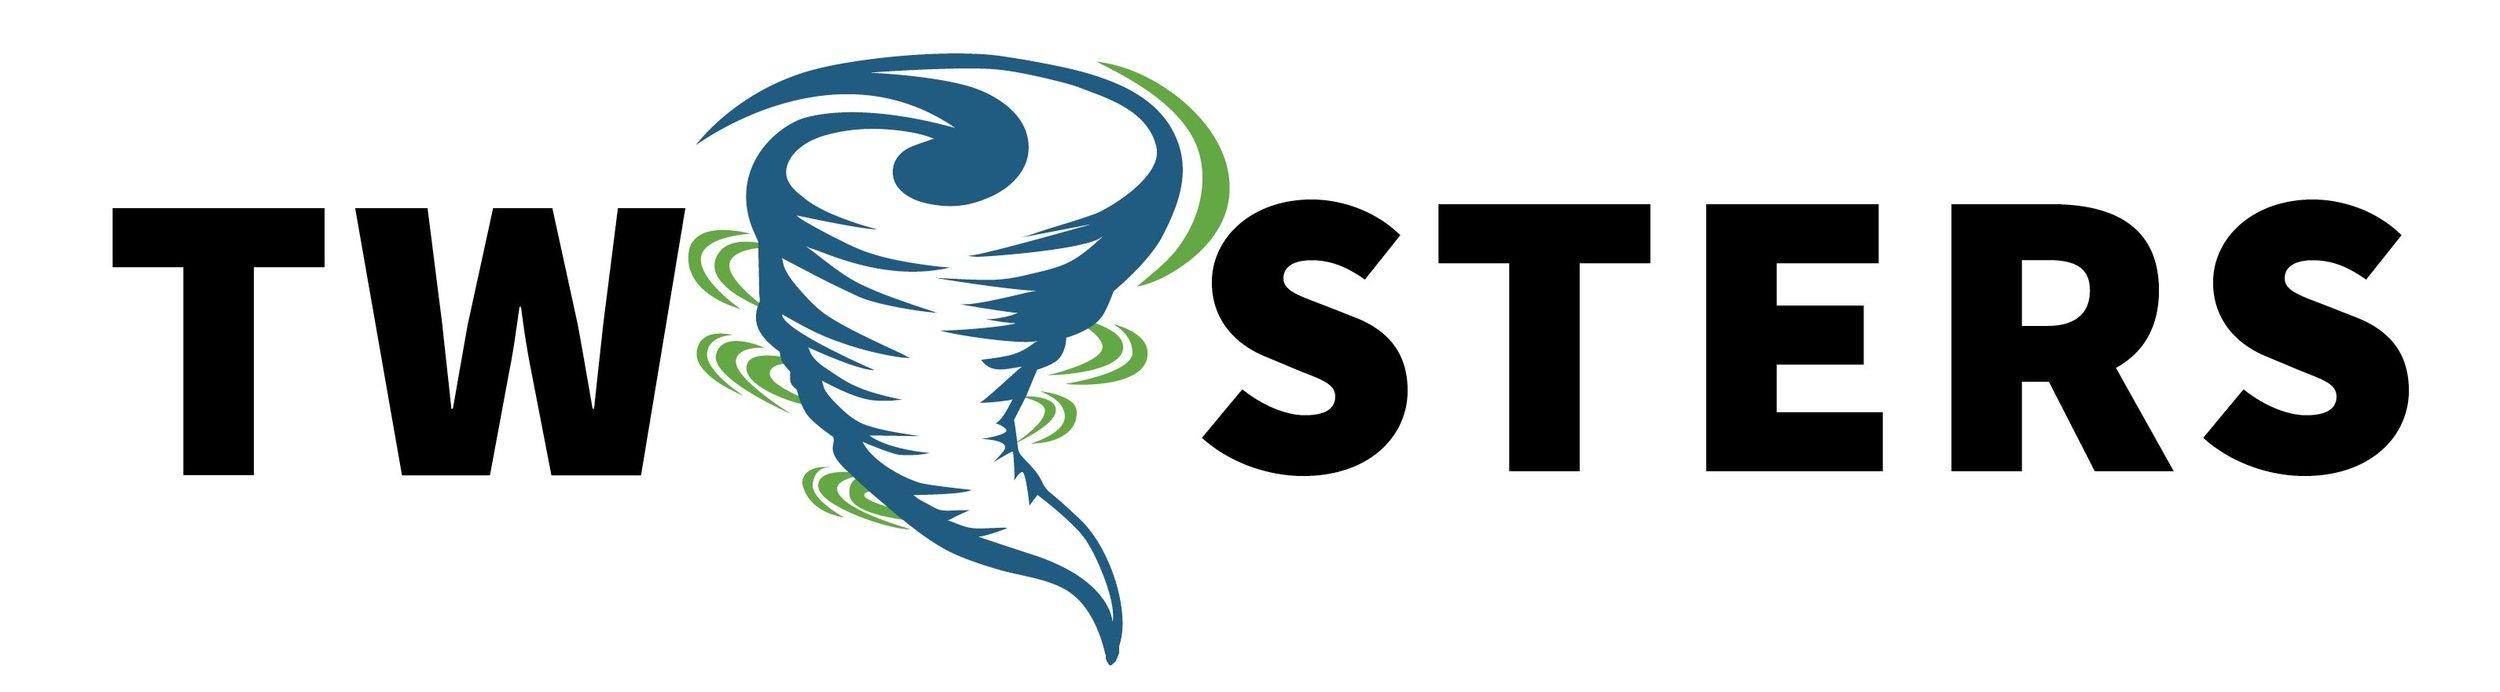 Twisters logo.jpg